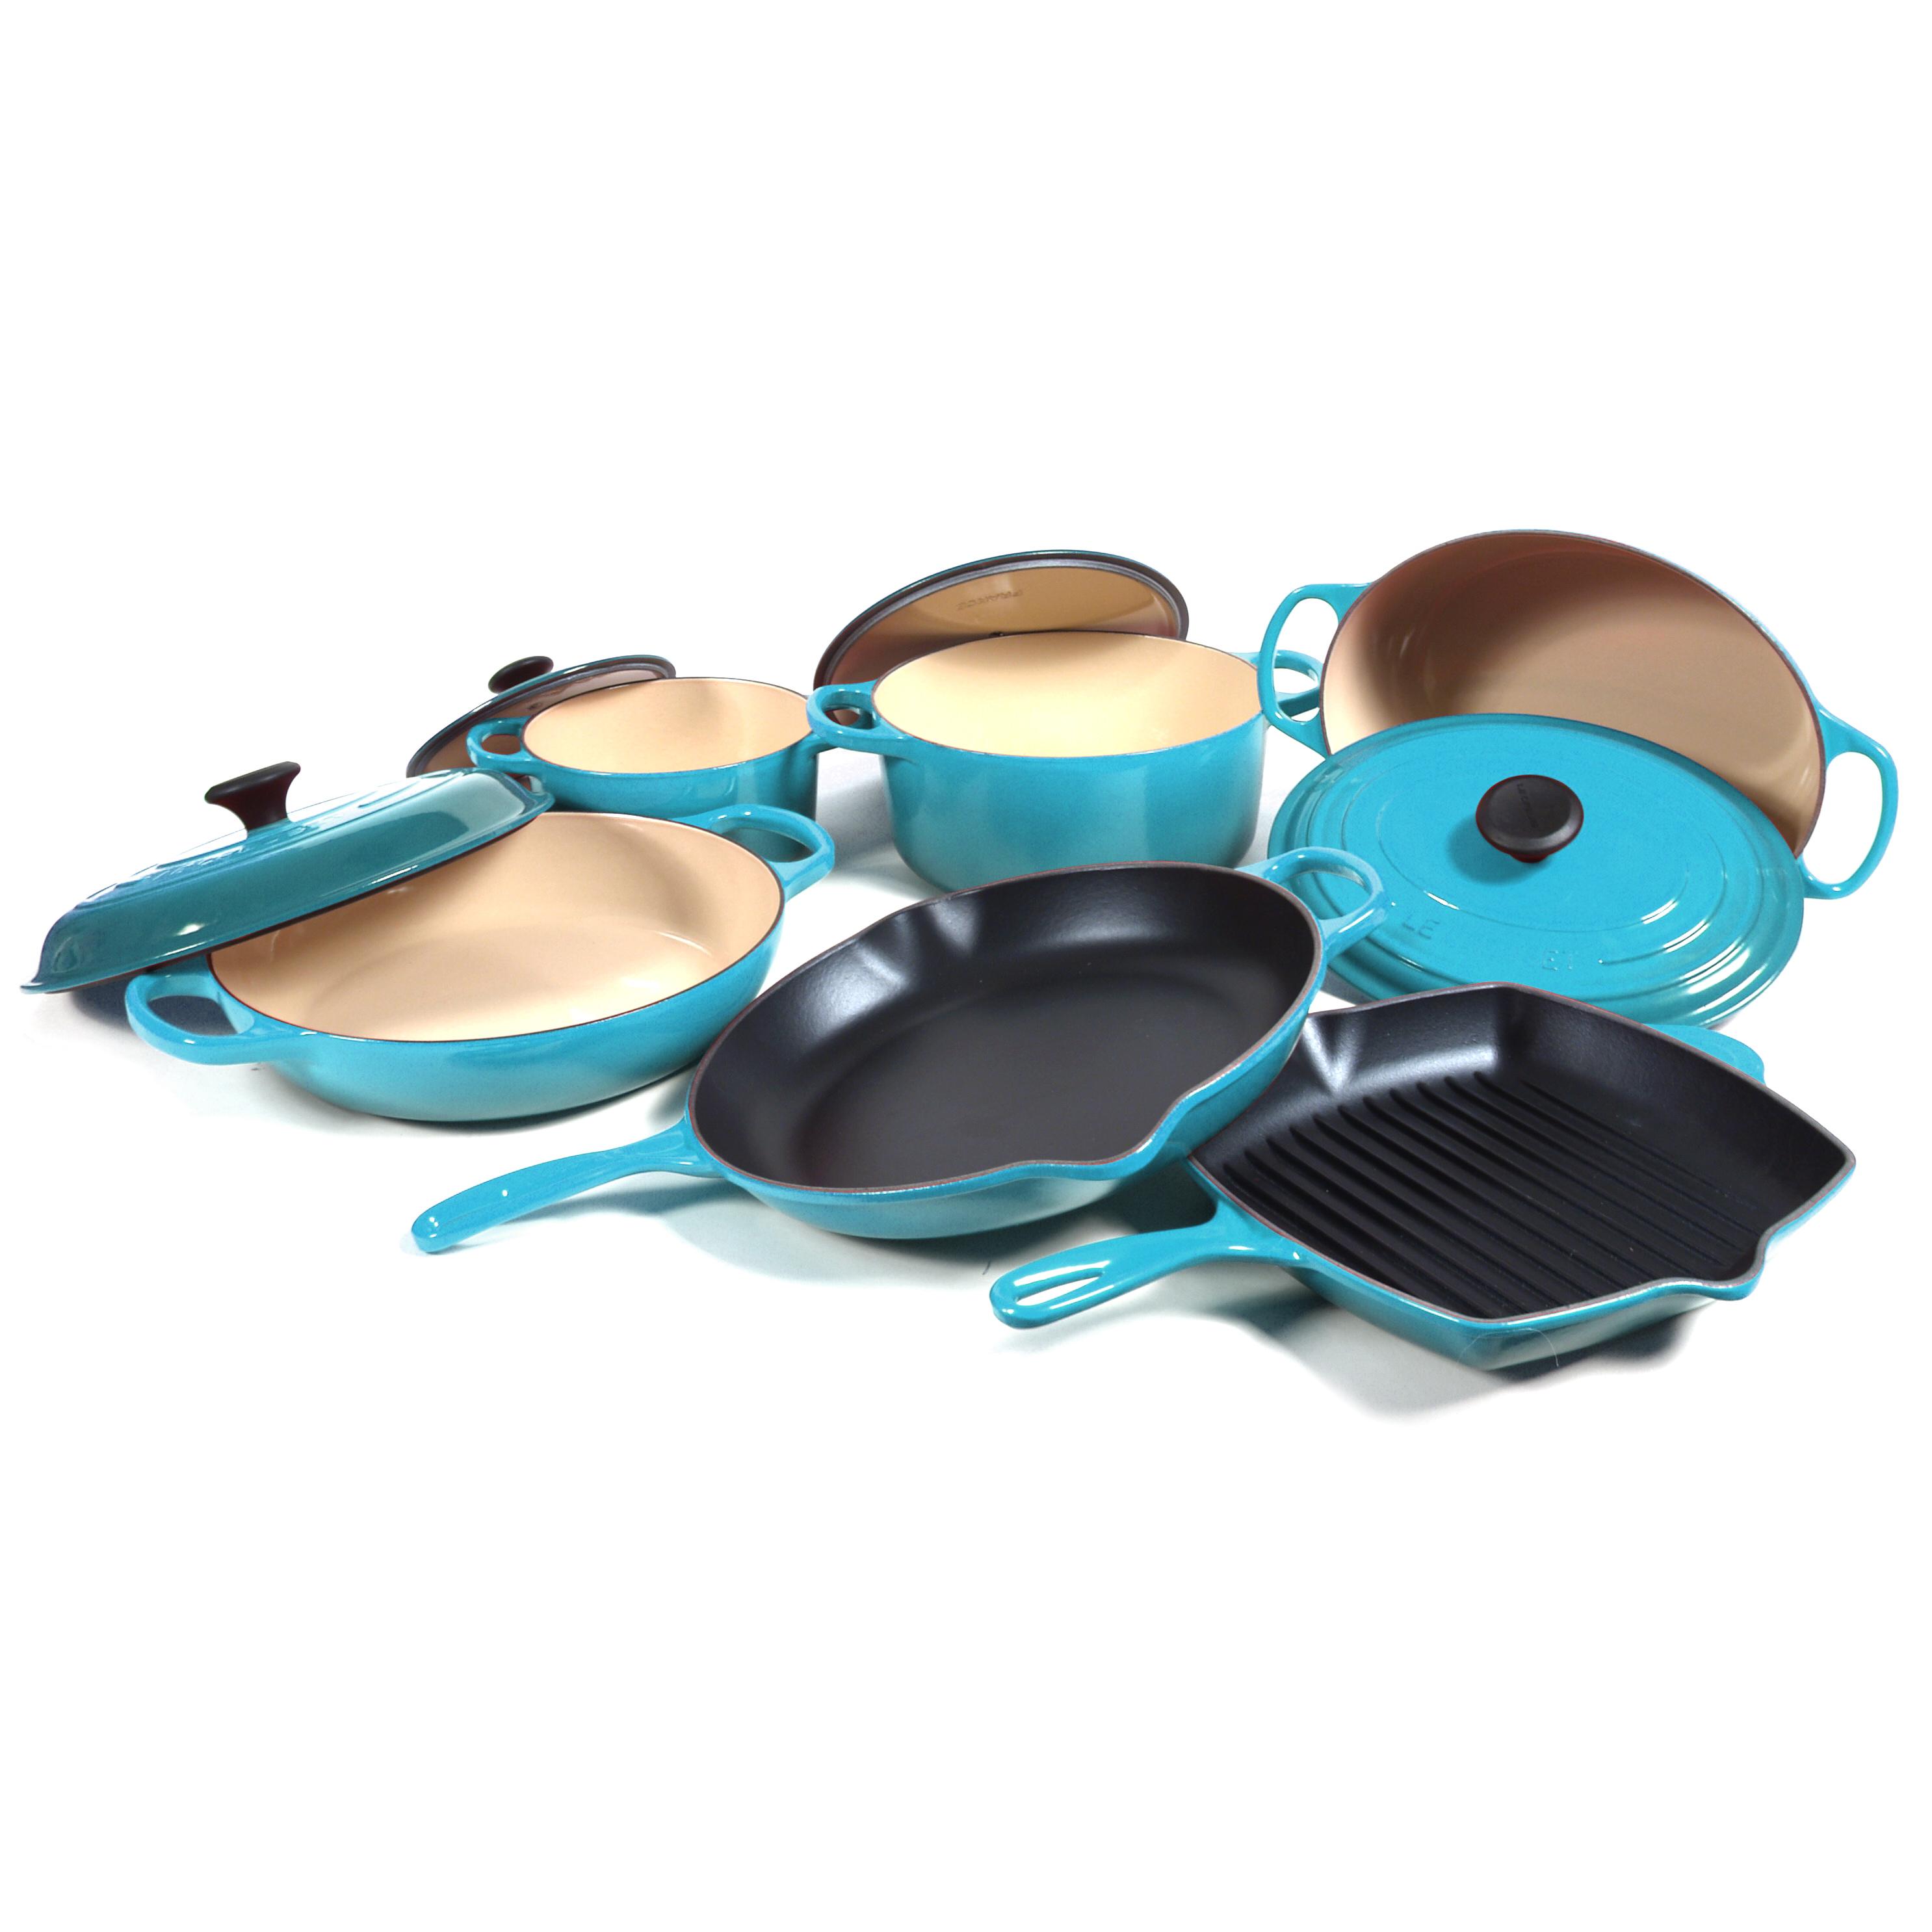 Le Creuset Signature 10 Piece Caribbean Enameled Cast Iron Cookware Set